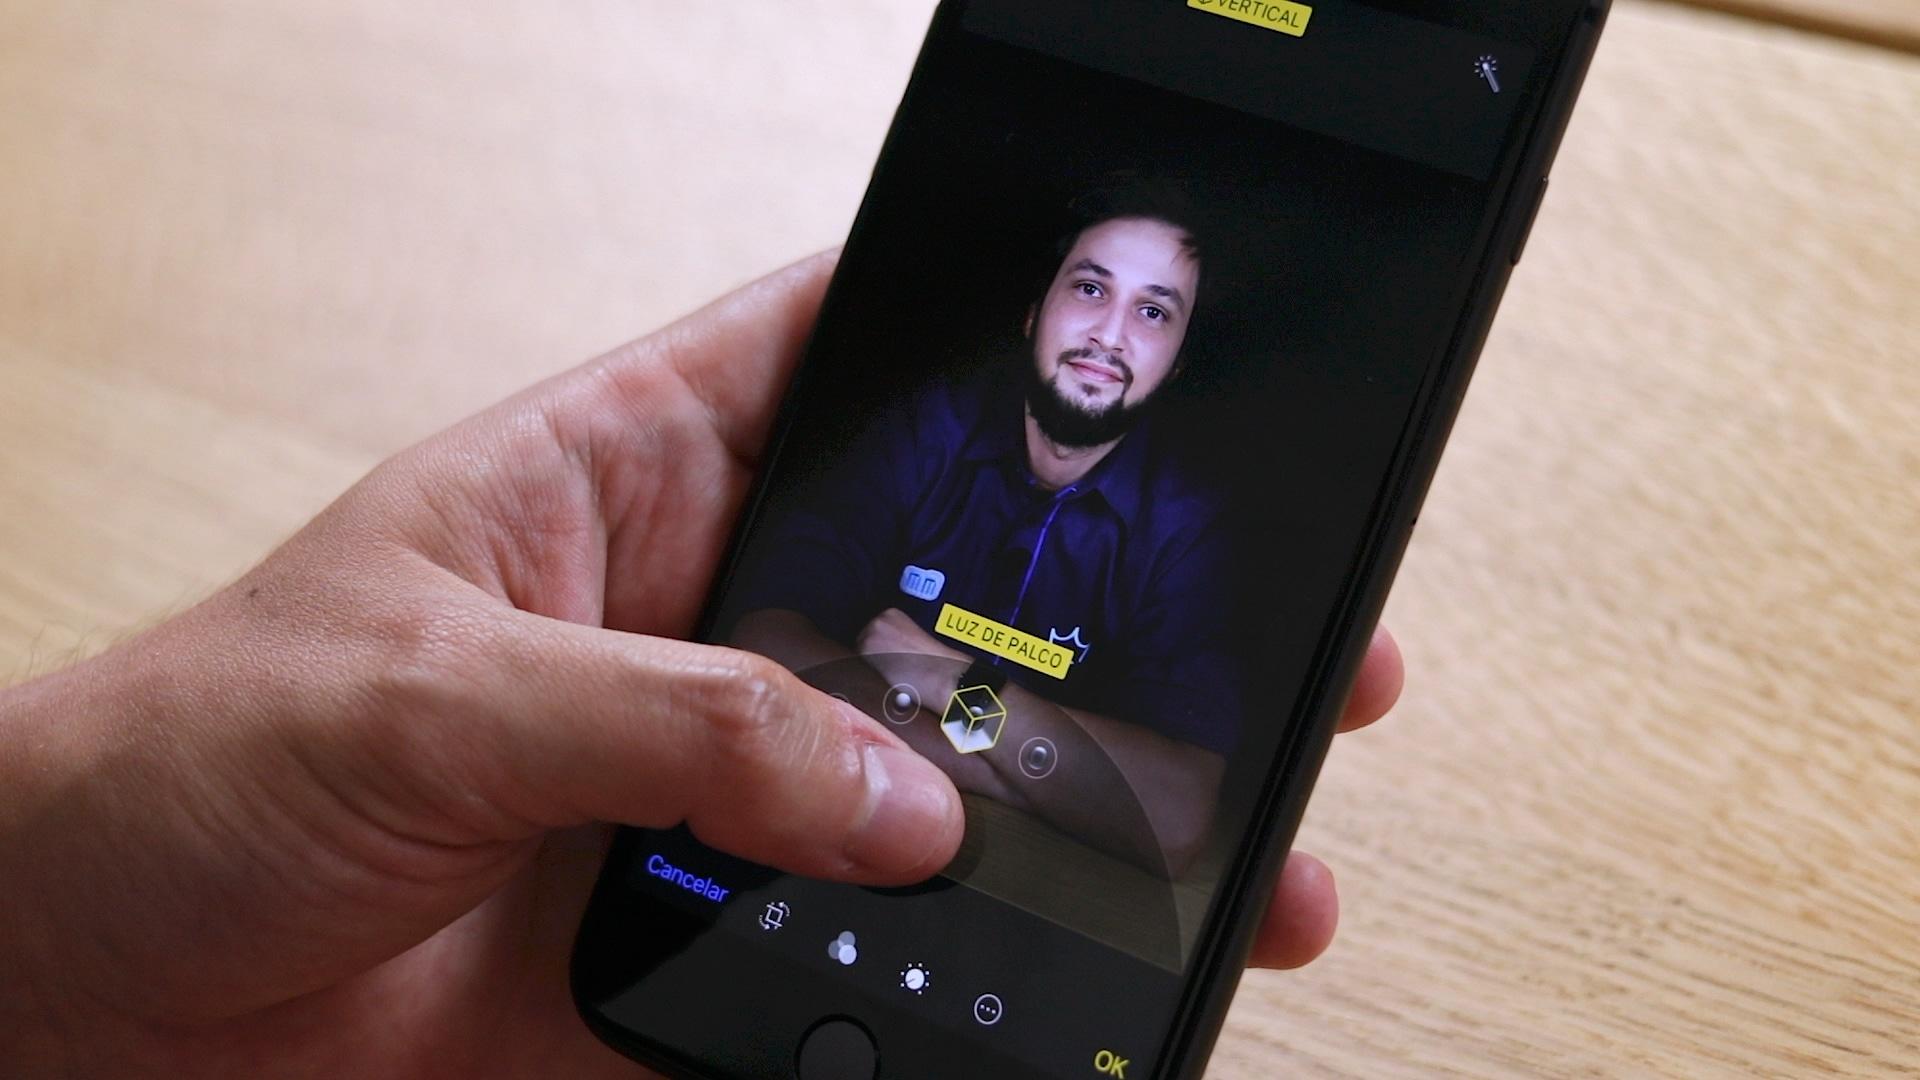 Vídeo de hands-on do iPhone 8 Plus